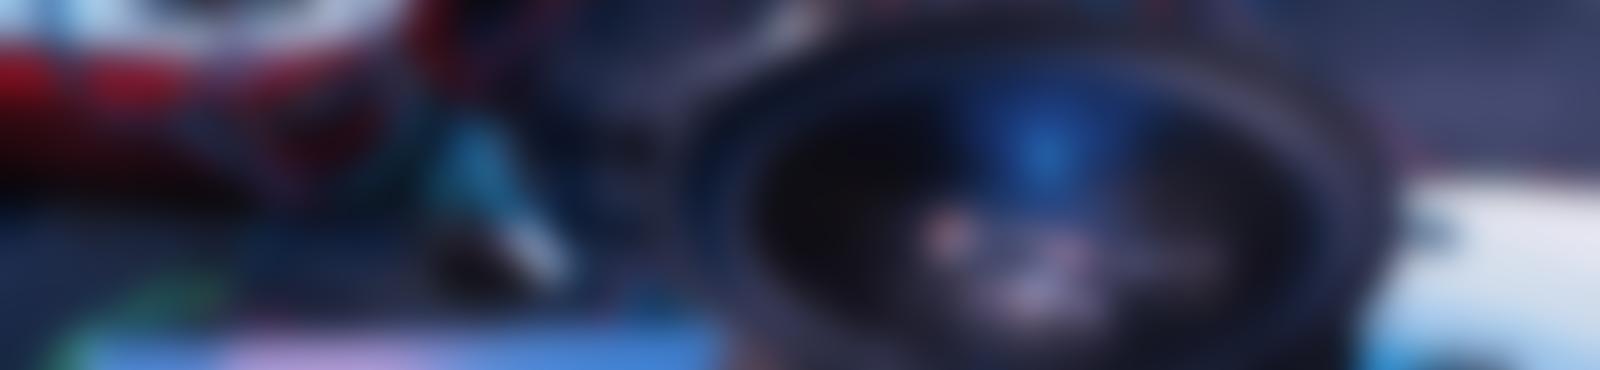 Blurred 22f9c755 5e46 4631 93c2 02bfb5fc9aa3